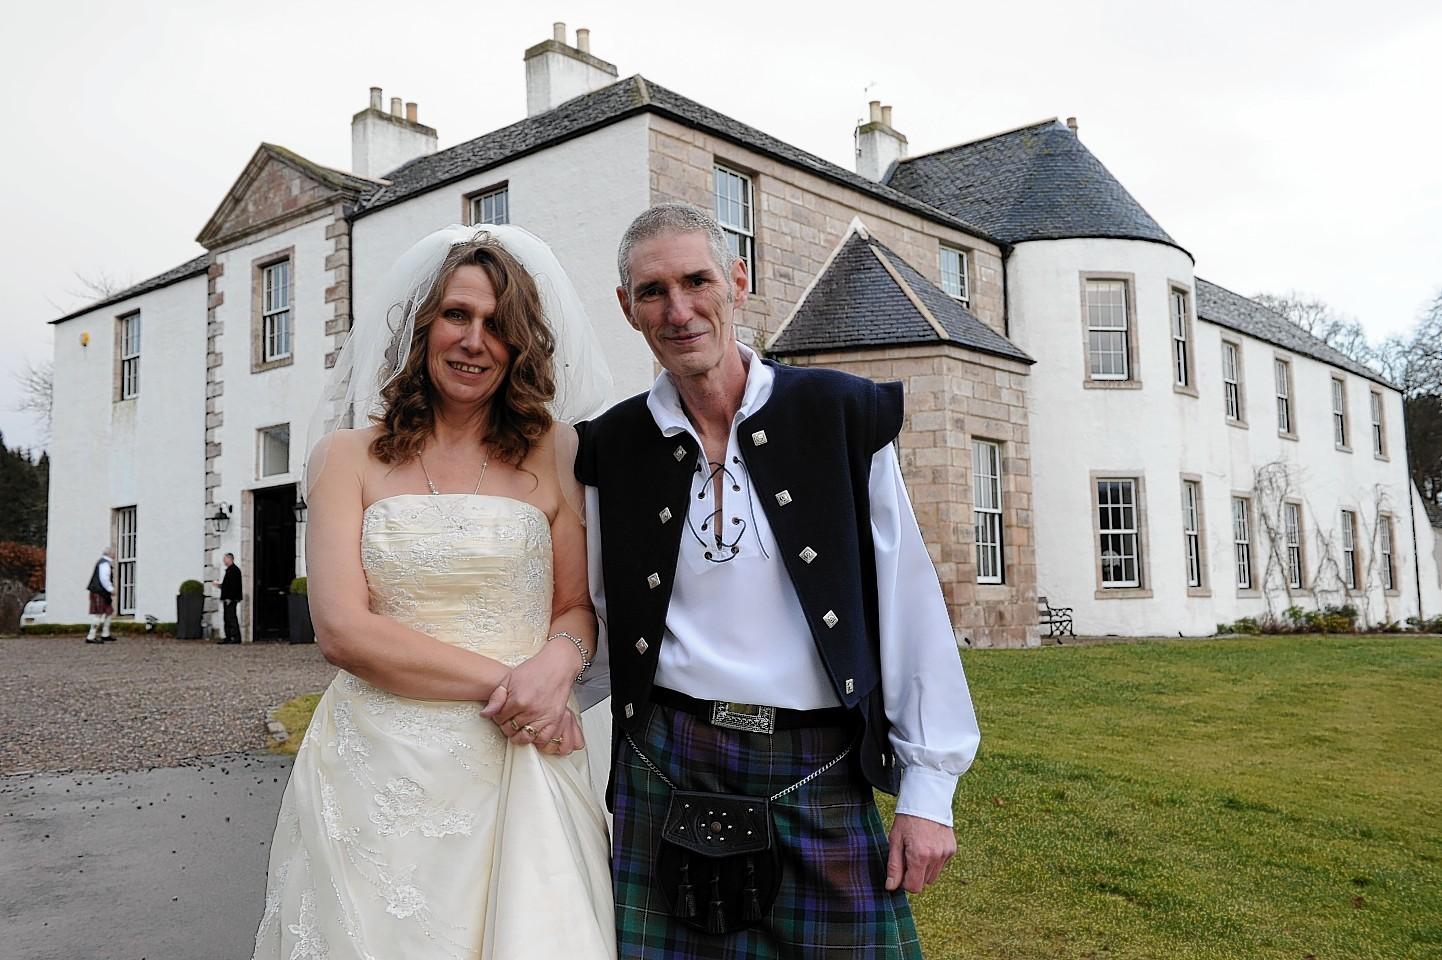 Keith Marley and Pauline Martin